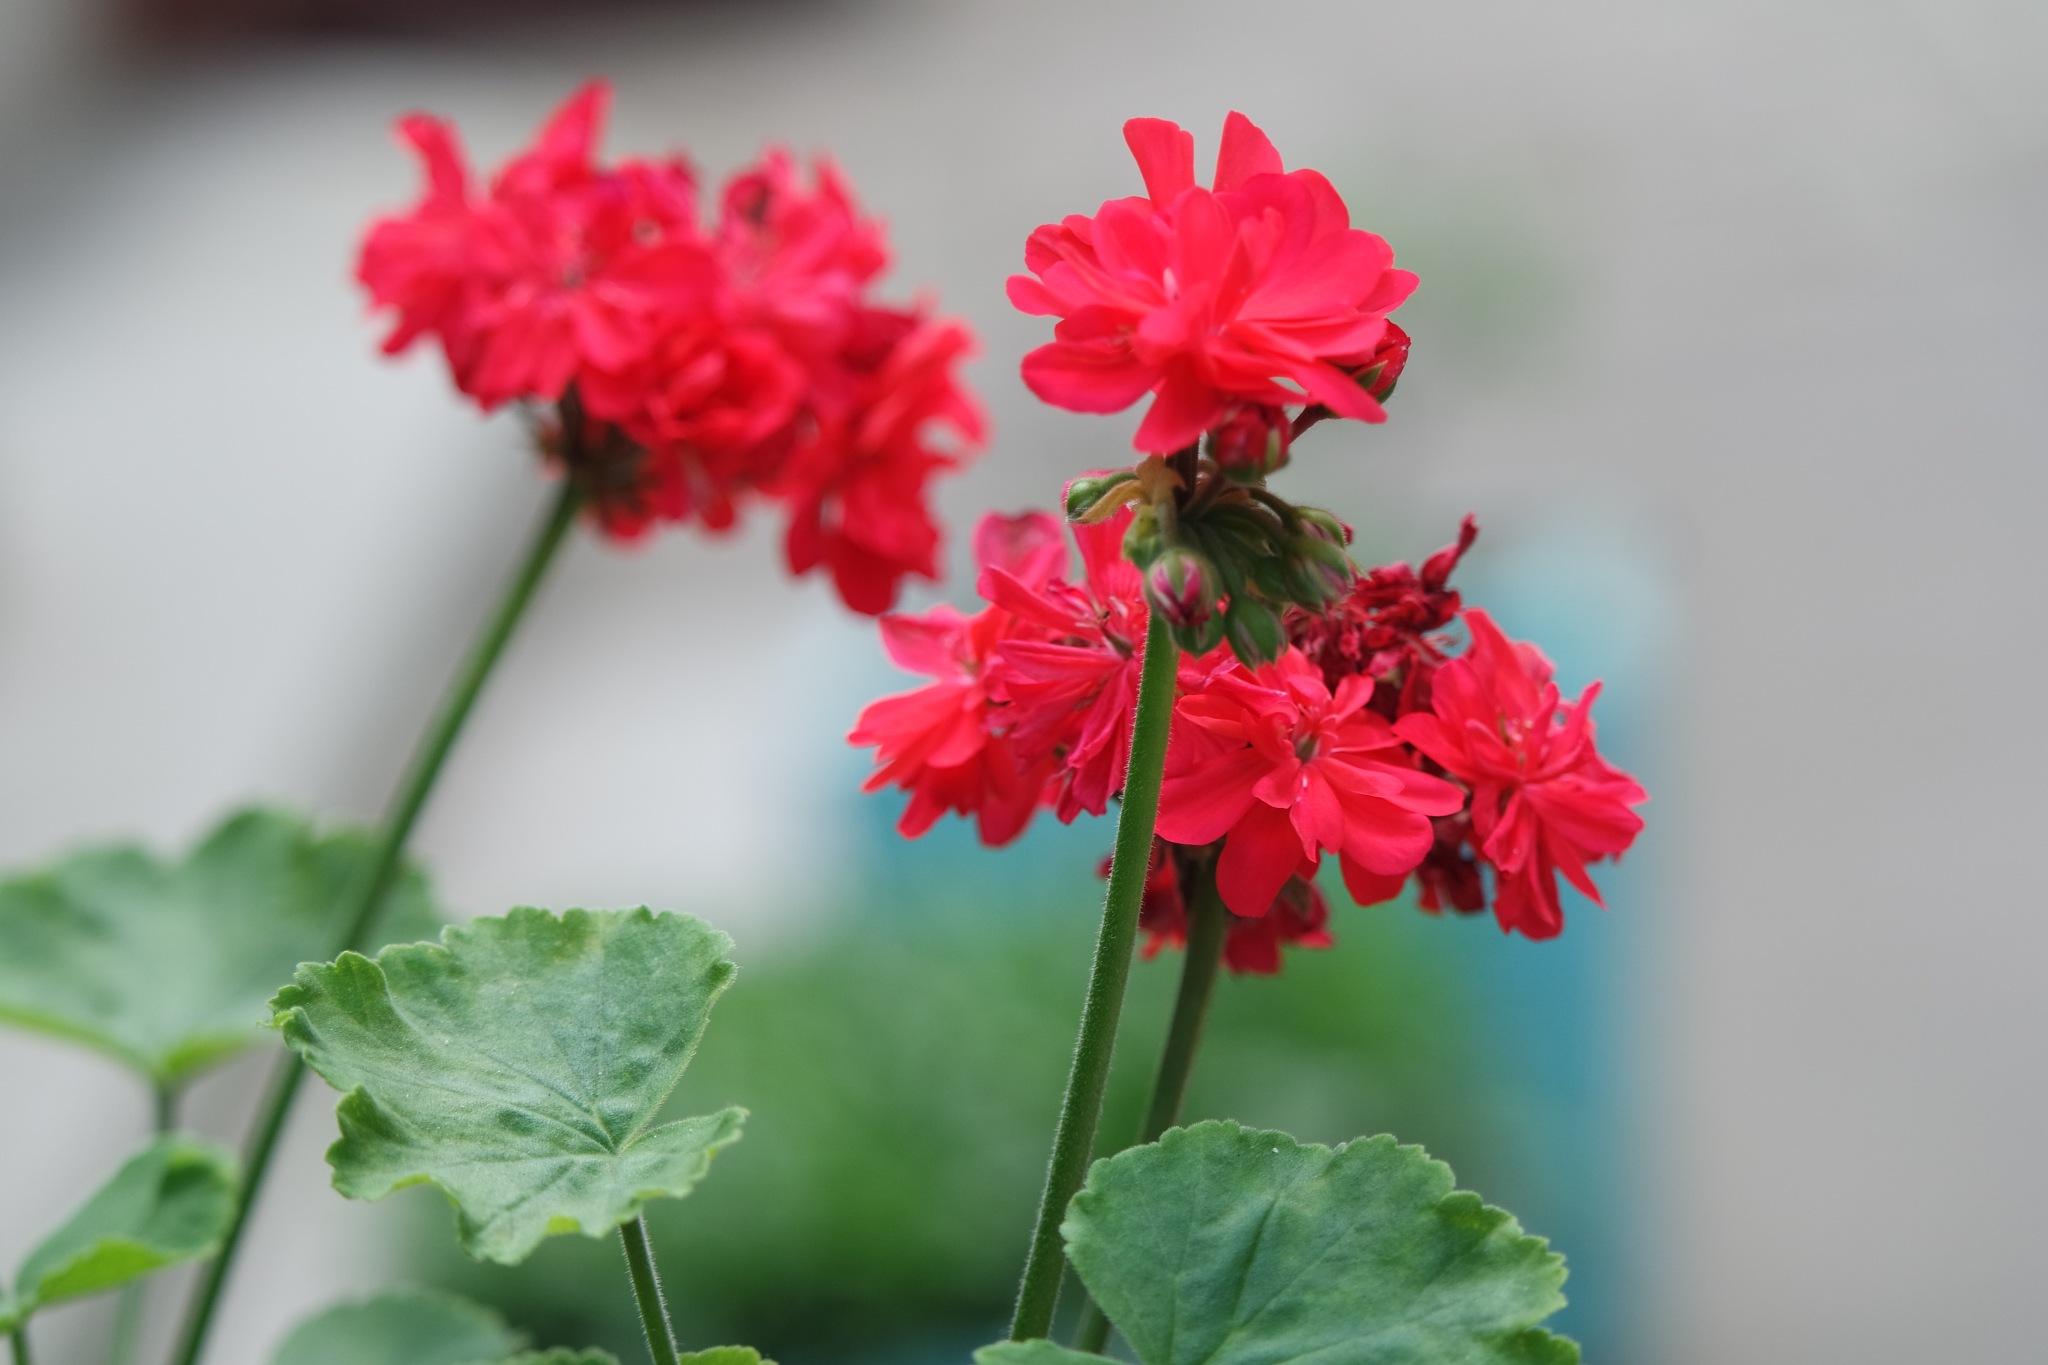 flower 3 by Rajesh Khurana